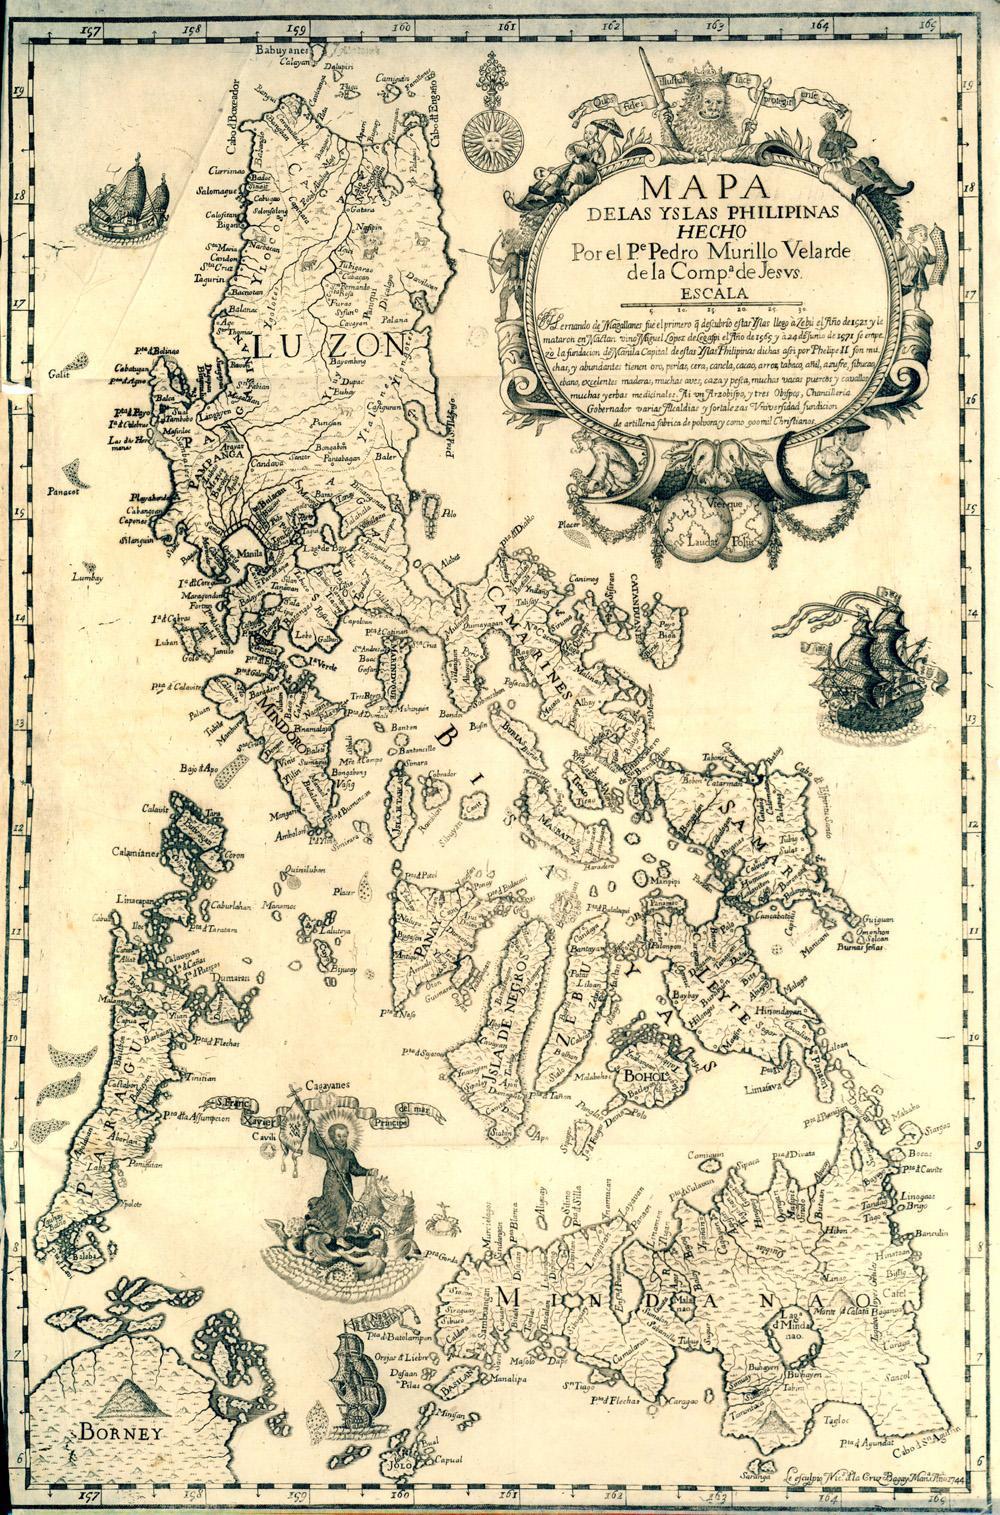 Mapa de les Filipines del pare jesuita Pedro Murillo Velarde